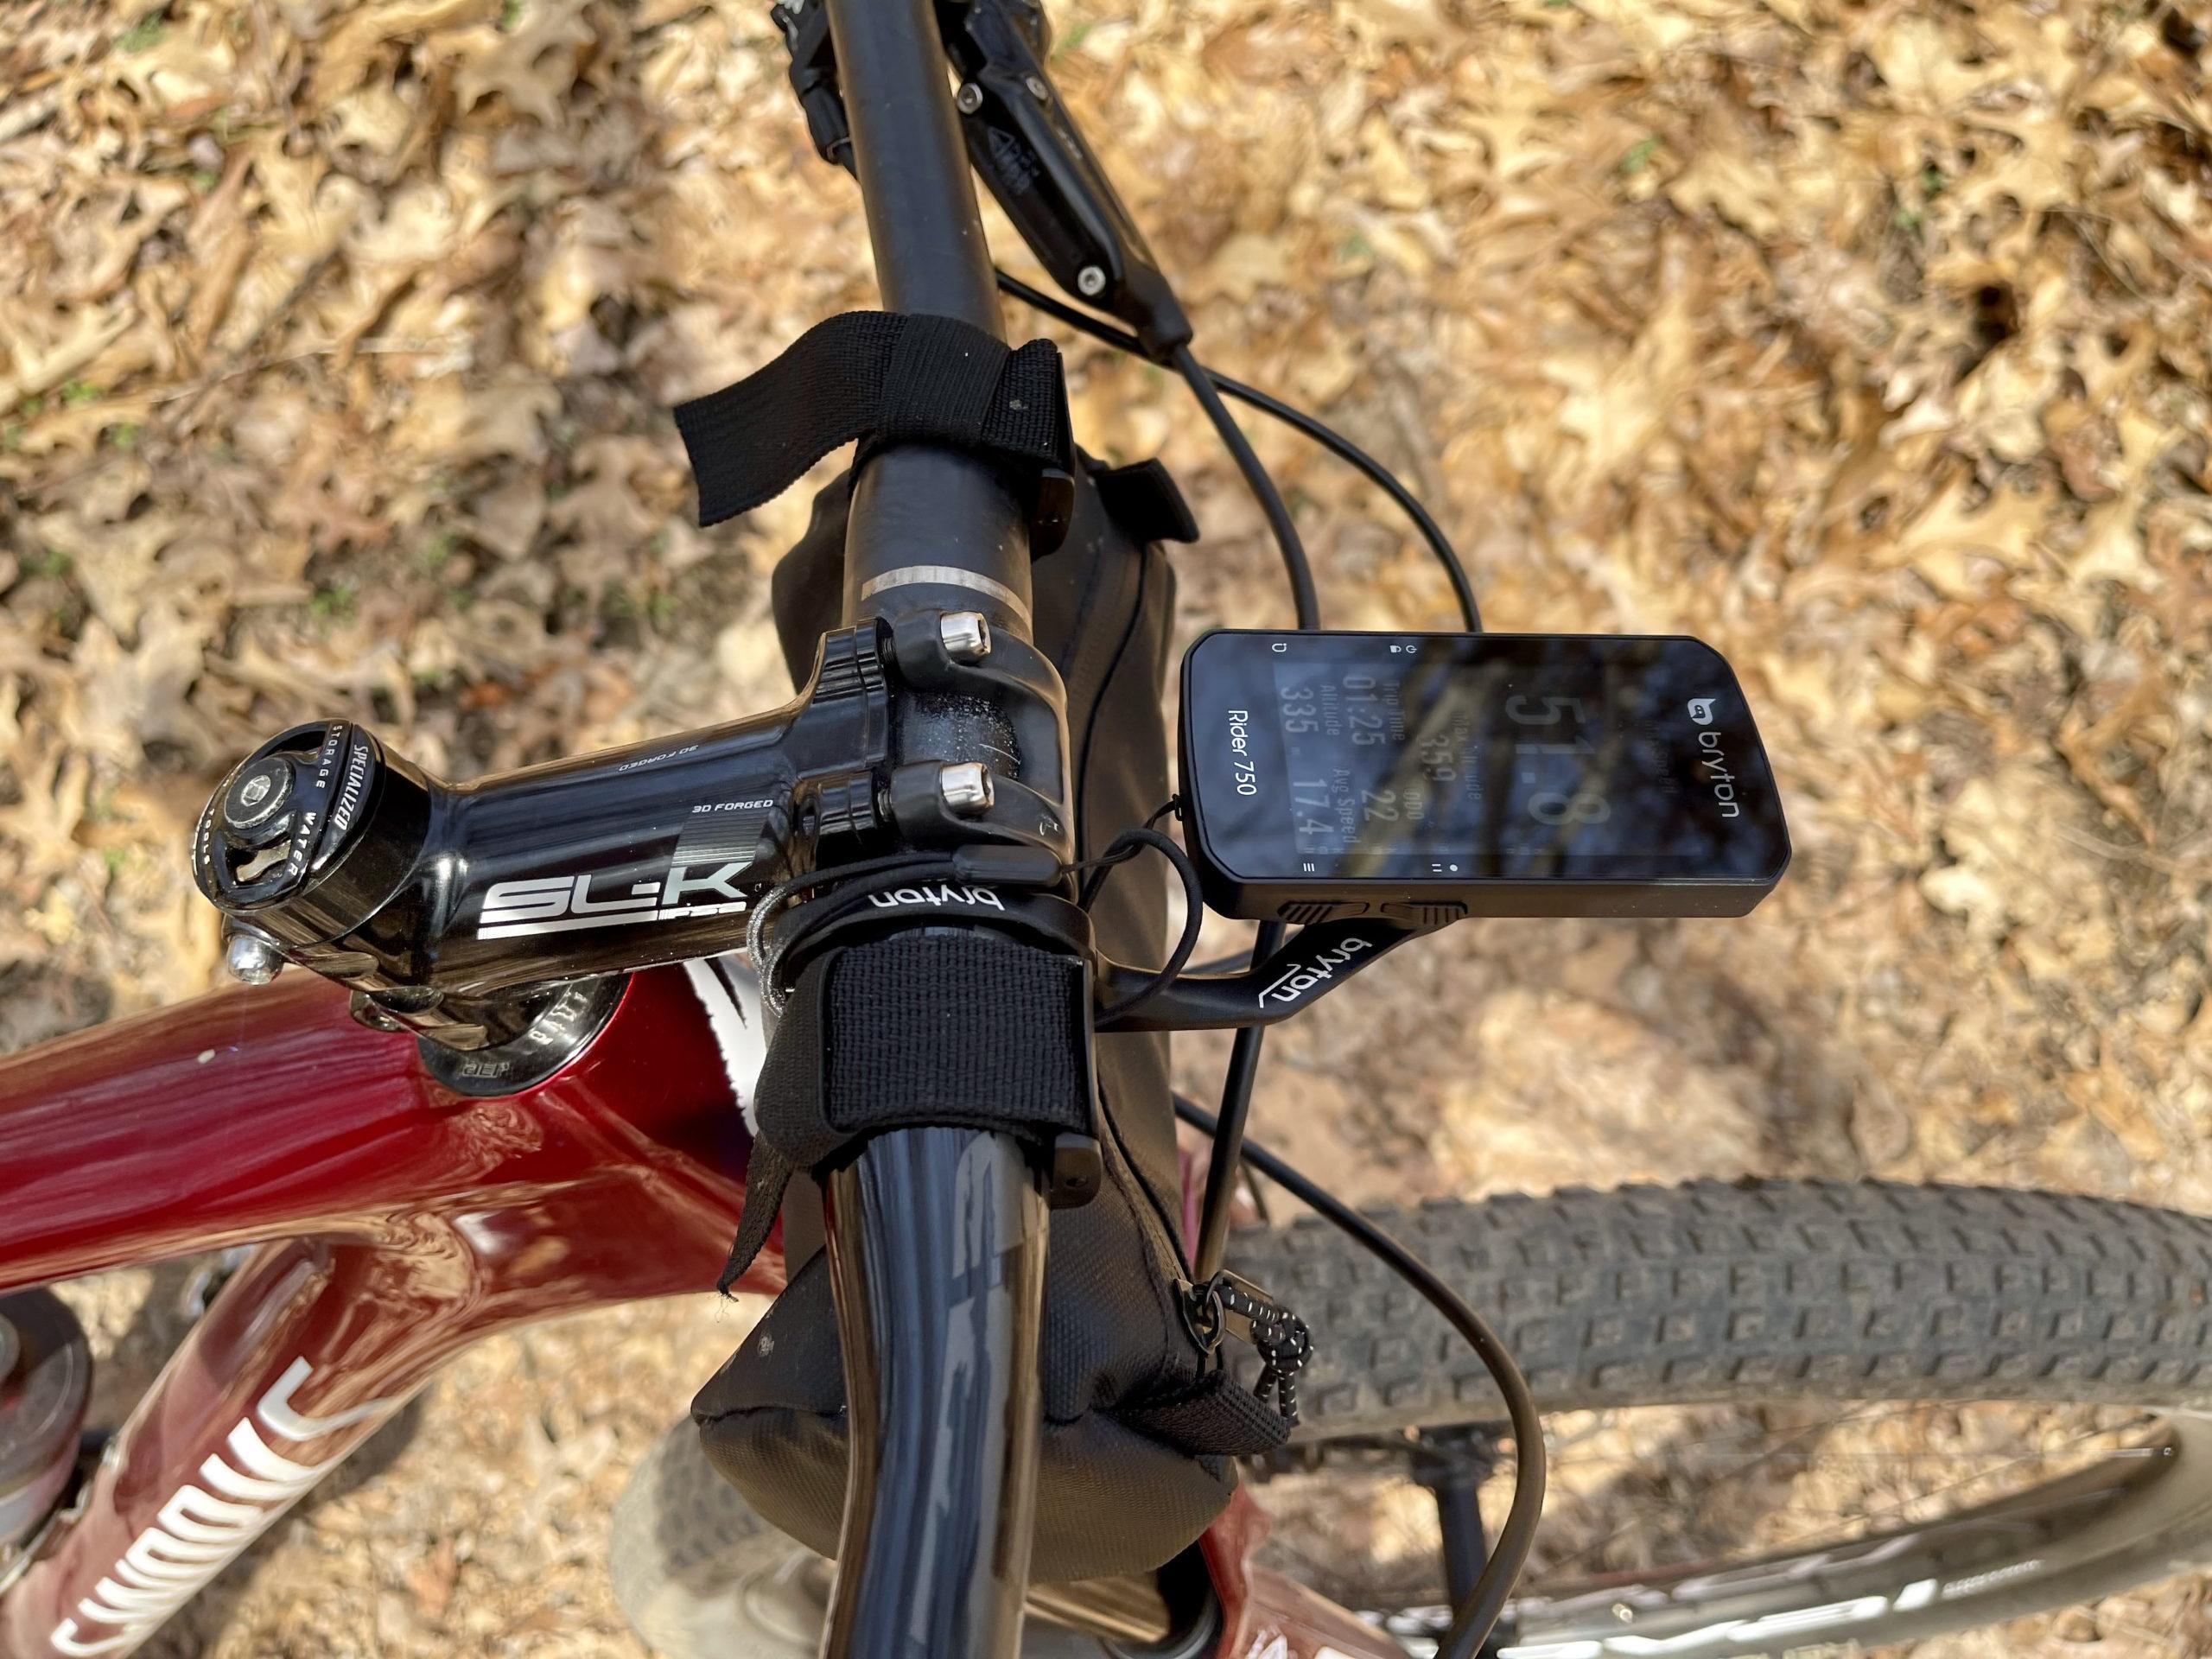 Bryton Rider 750 Review unit close up